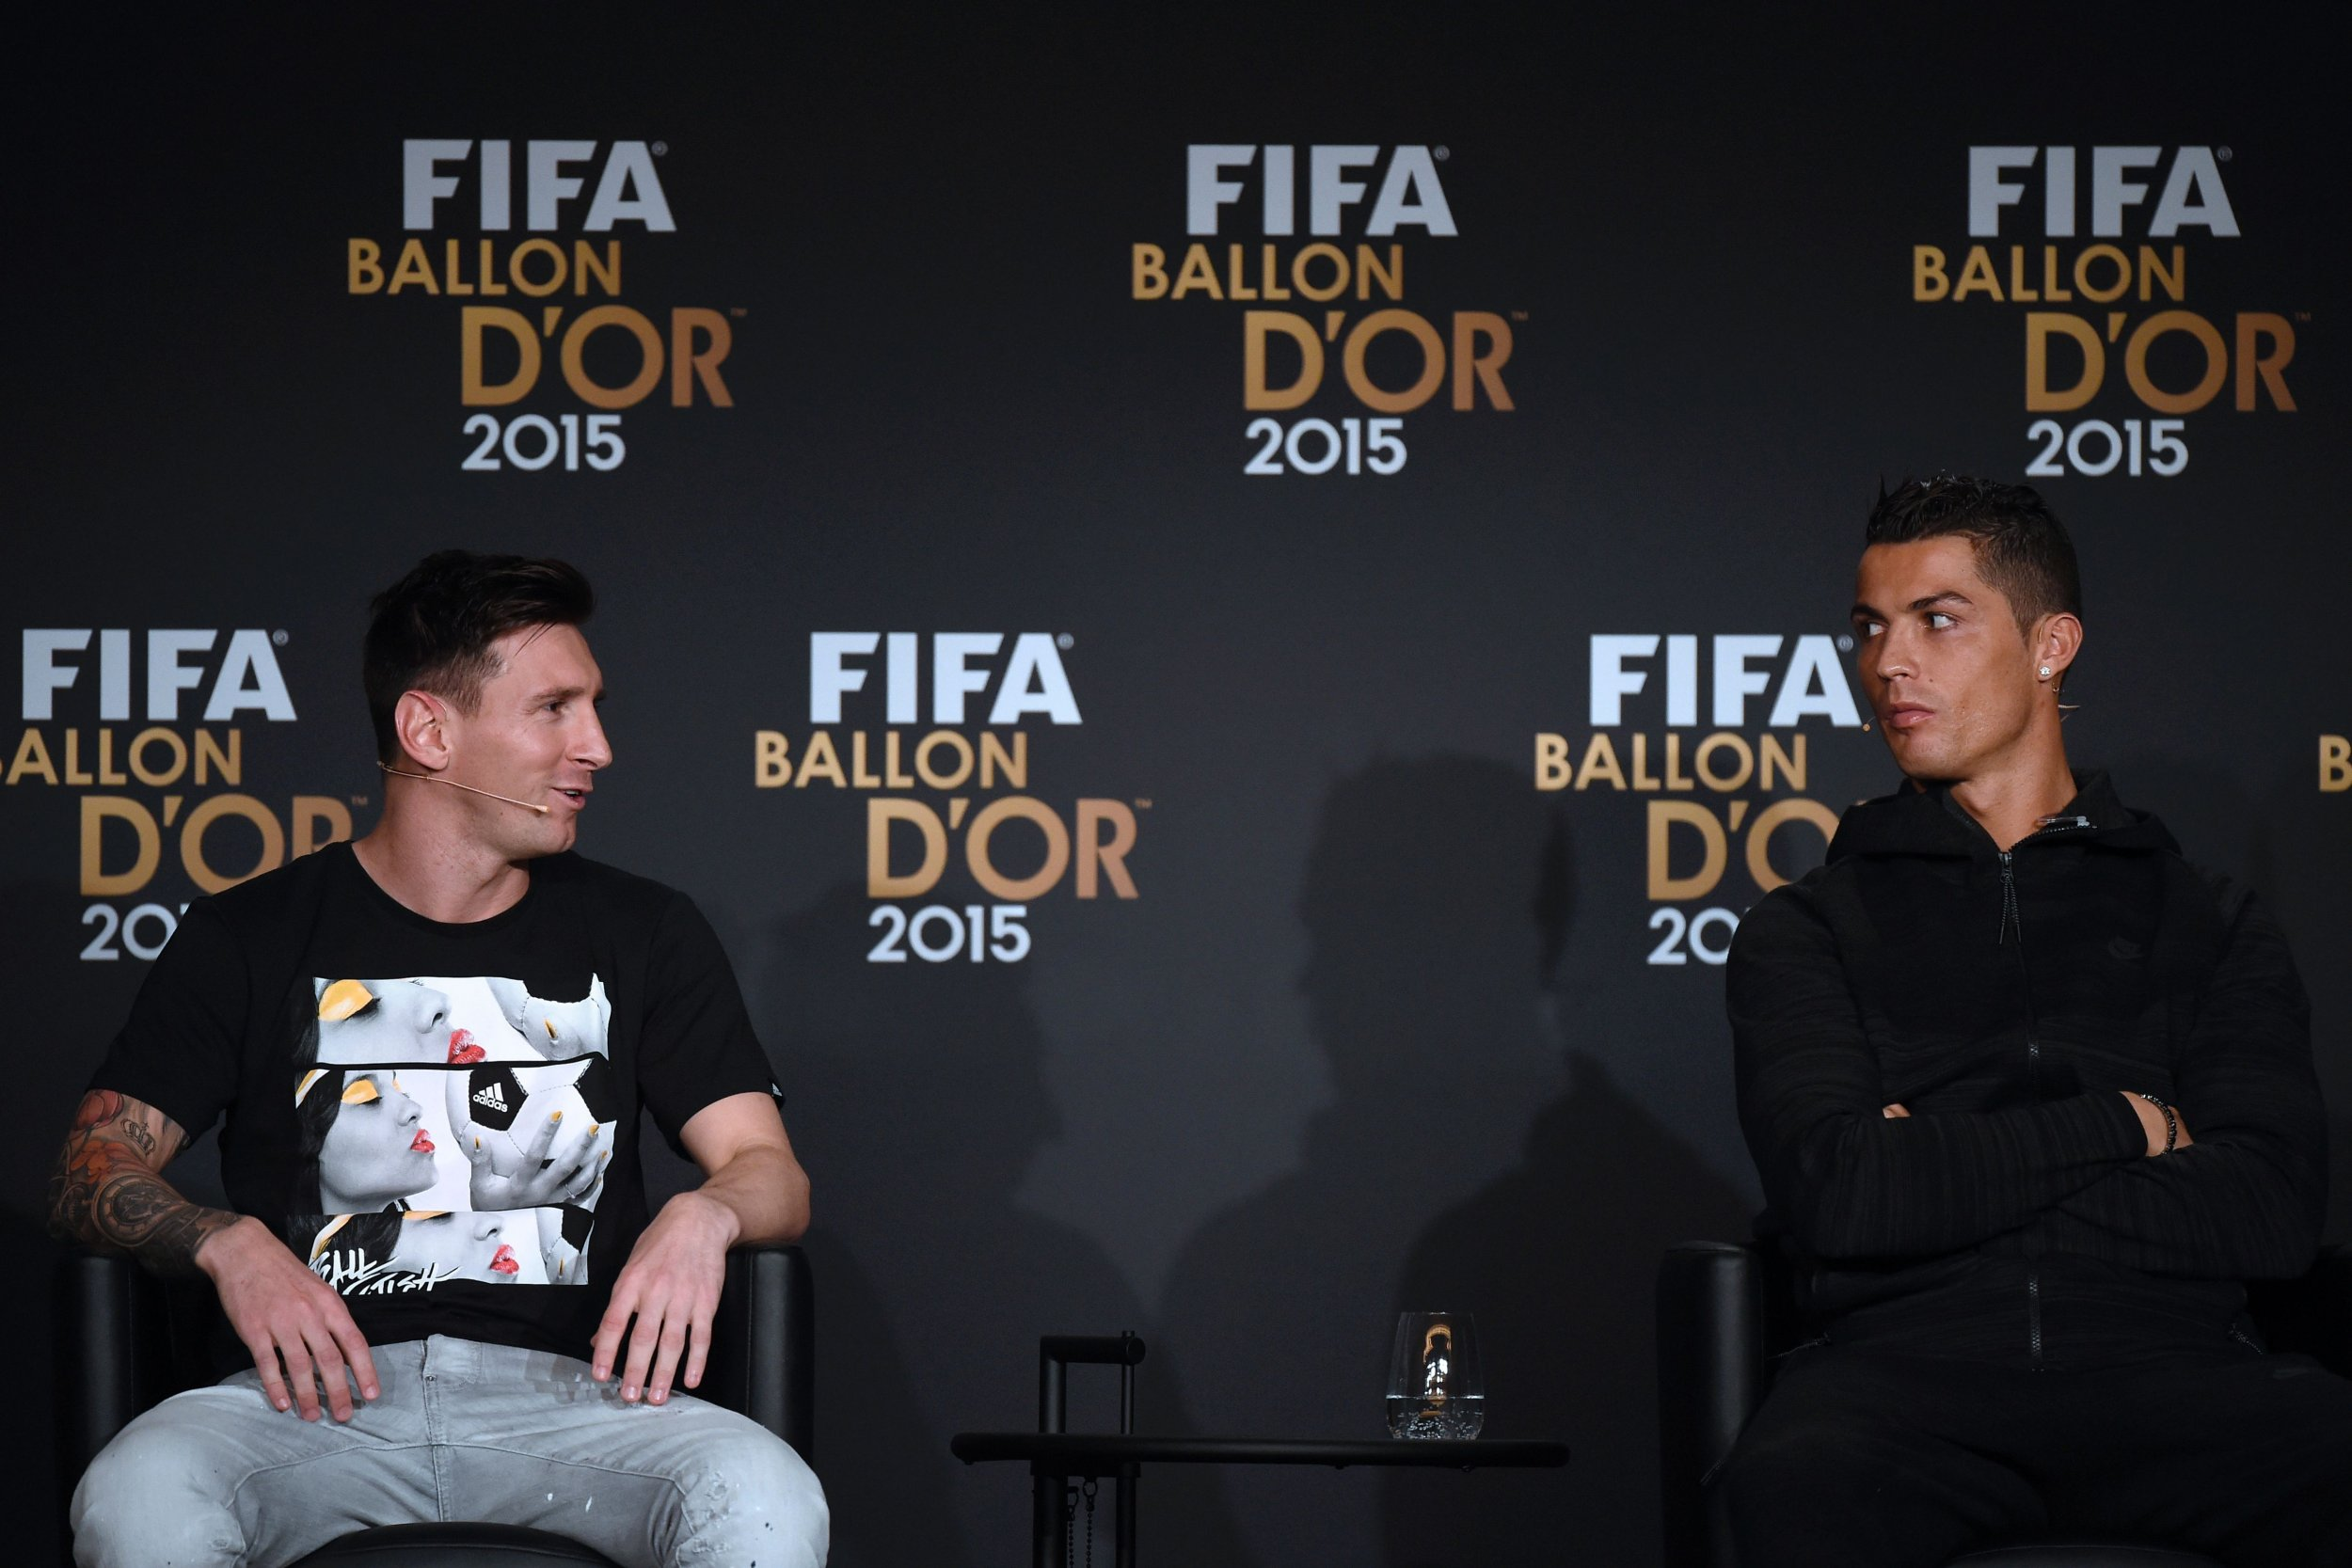 Cristiano Ronaldo and Lionel Messi at the FIFA Ballon d'Or ceremony in January 2016.